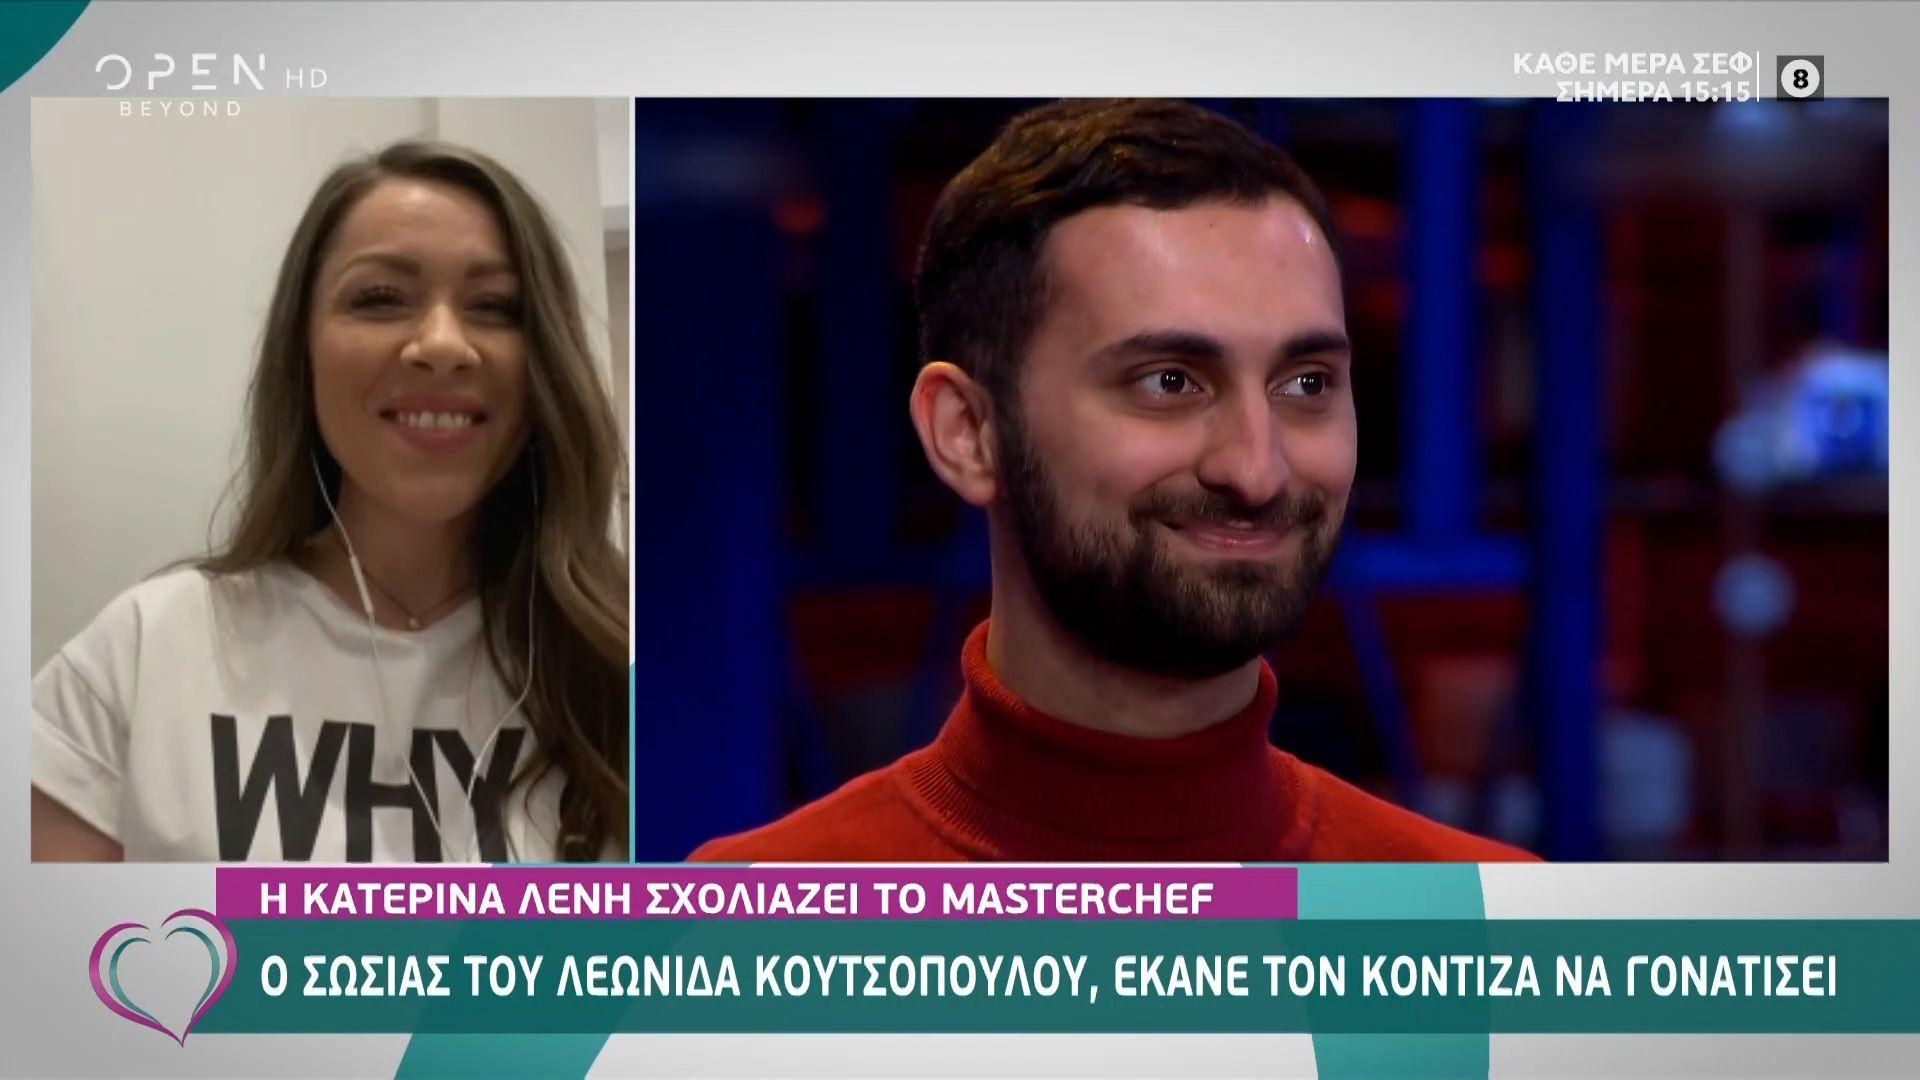 MasterChef: Ο σωσίας του Λεωνίδα Κουτσόπουλου έκανε τον Κοντιζά να γονατίσει (vid)   panathinaikos24.gr